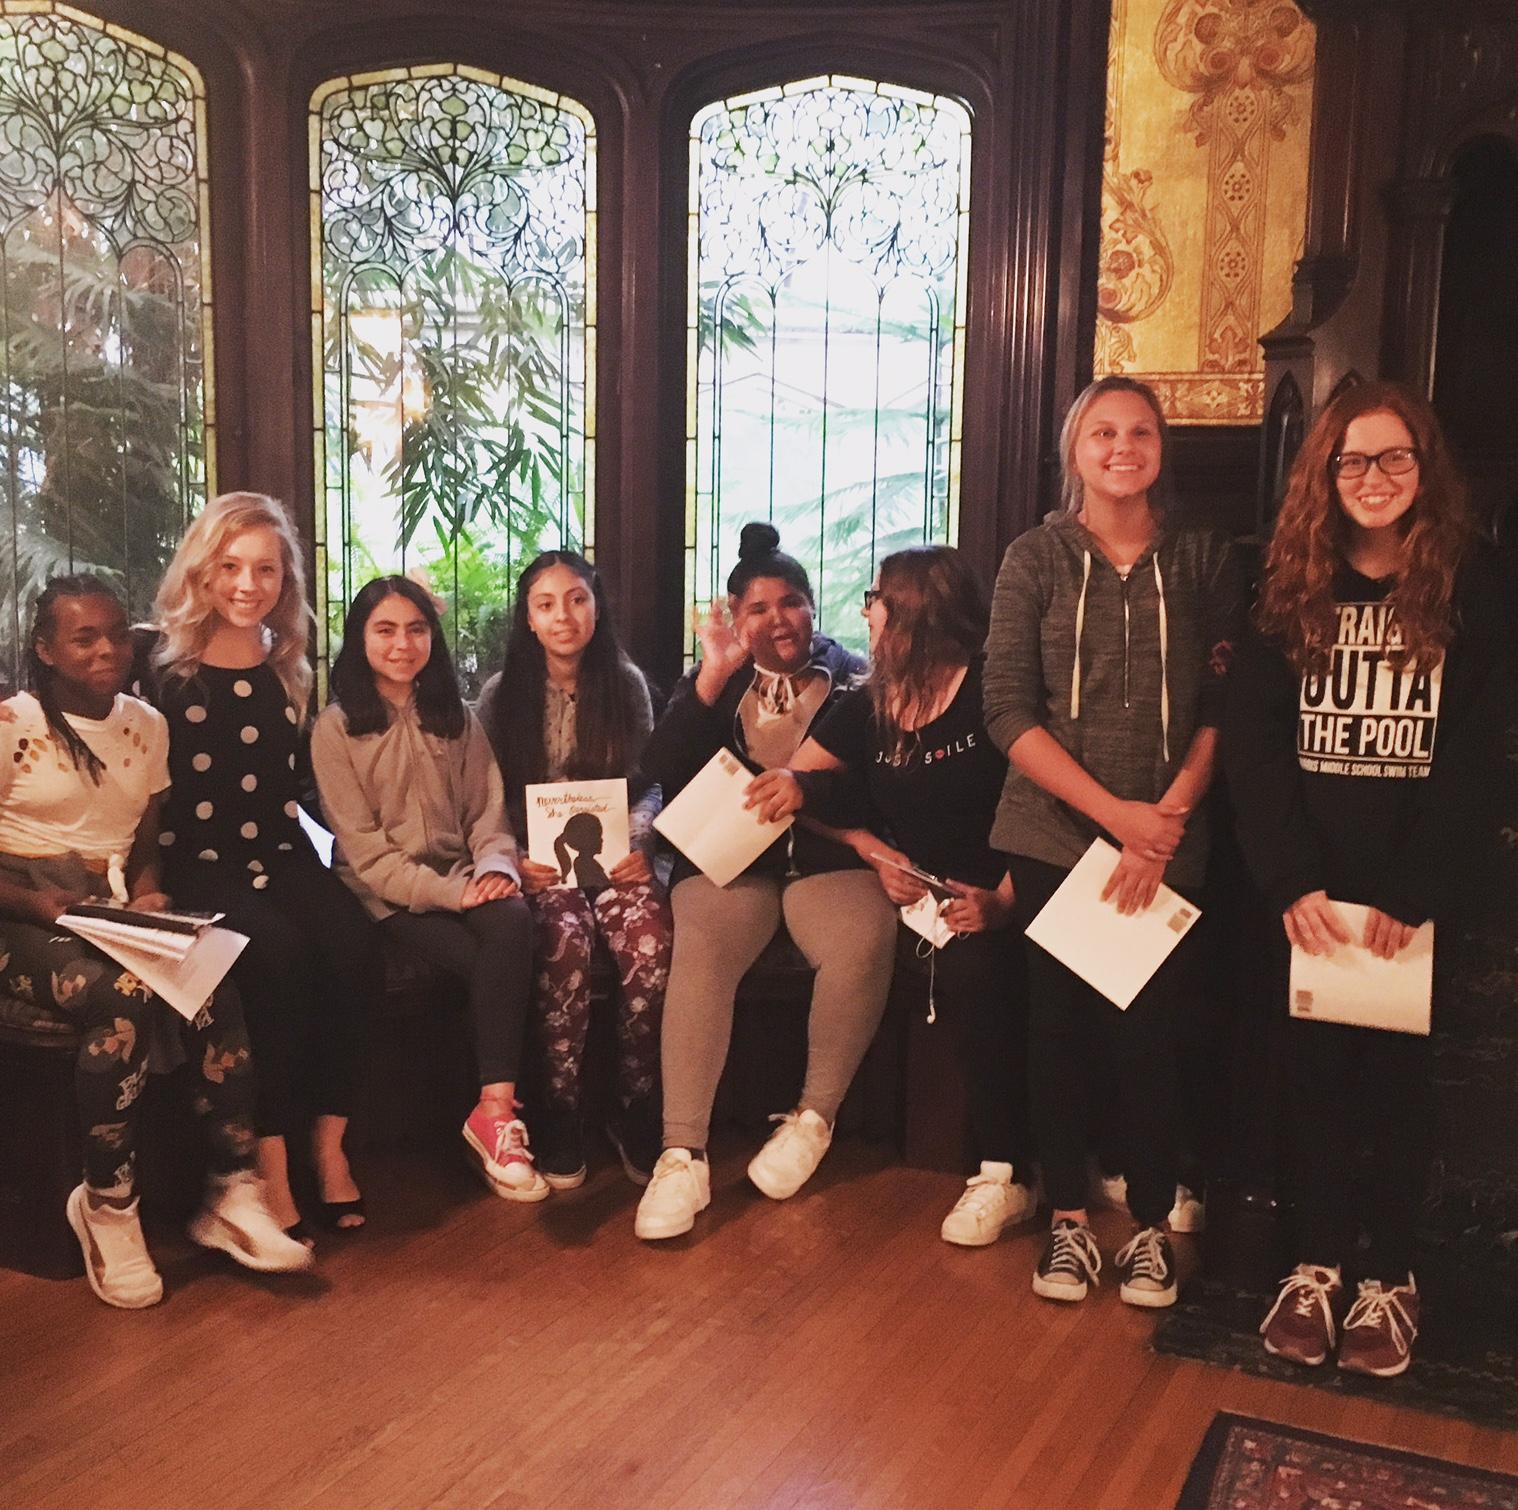 From Sarah Joslyn Comes a Celebration of Nebraska's Women